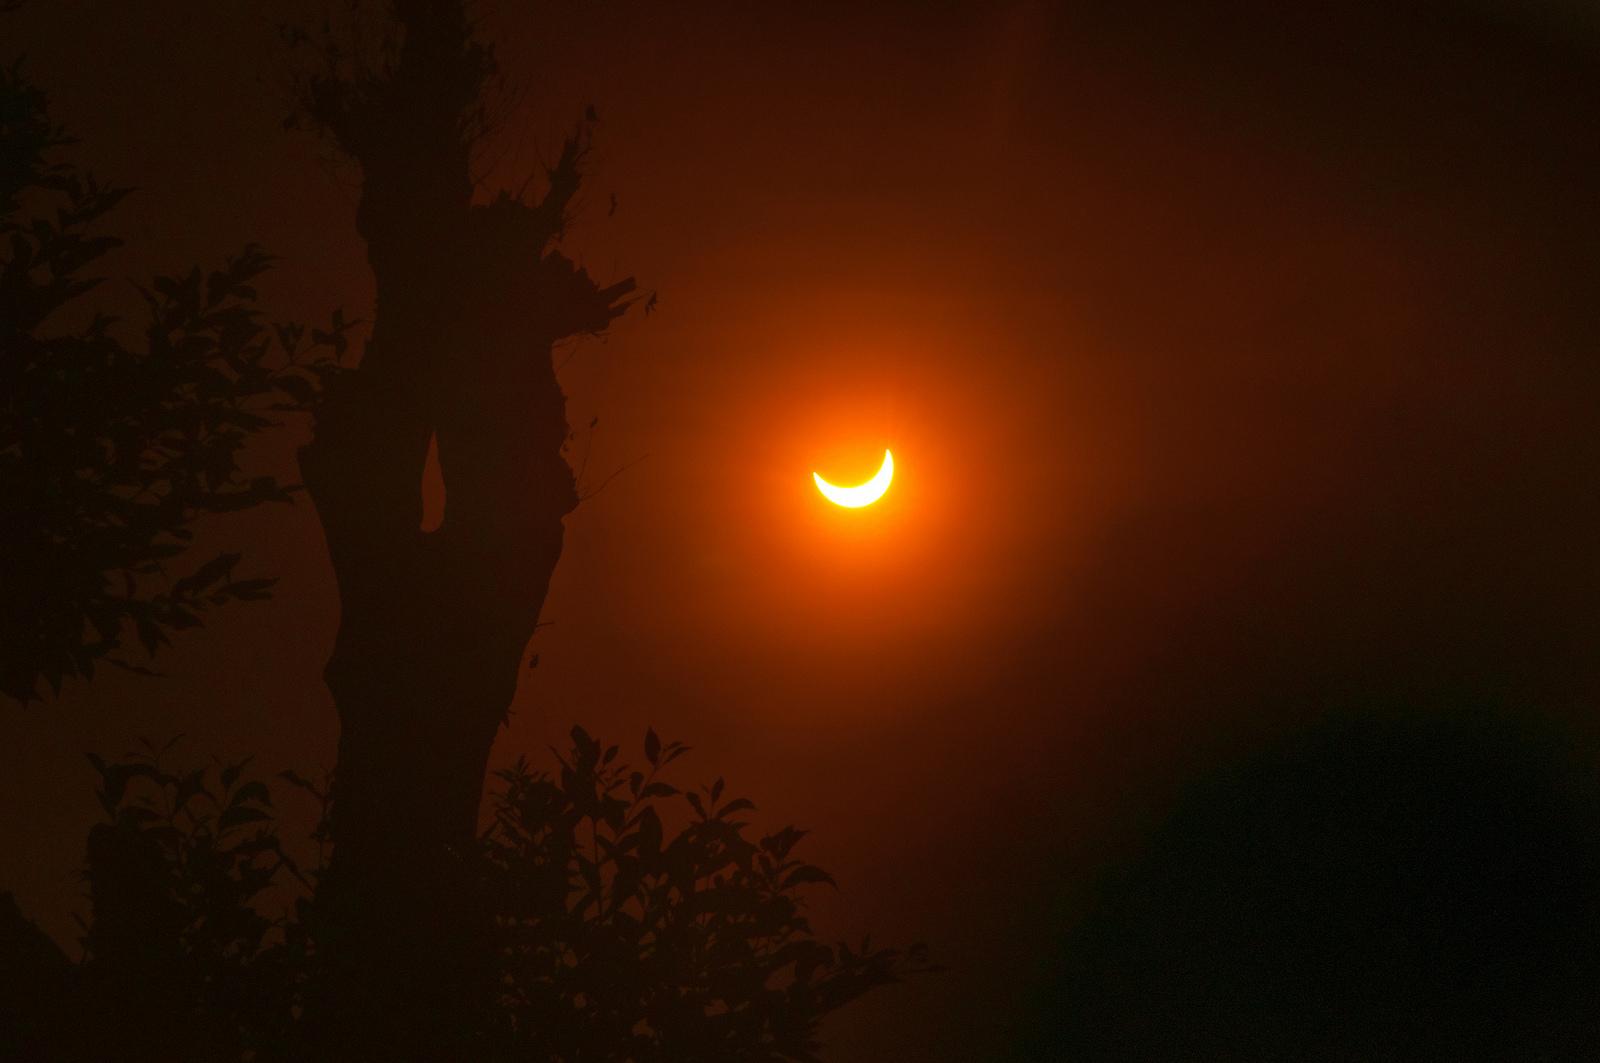 Hiram Eclipse Watch August 21 Stephens Memorial Observatory